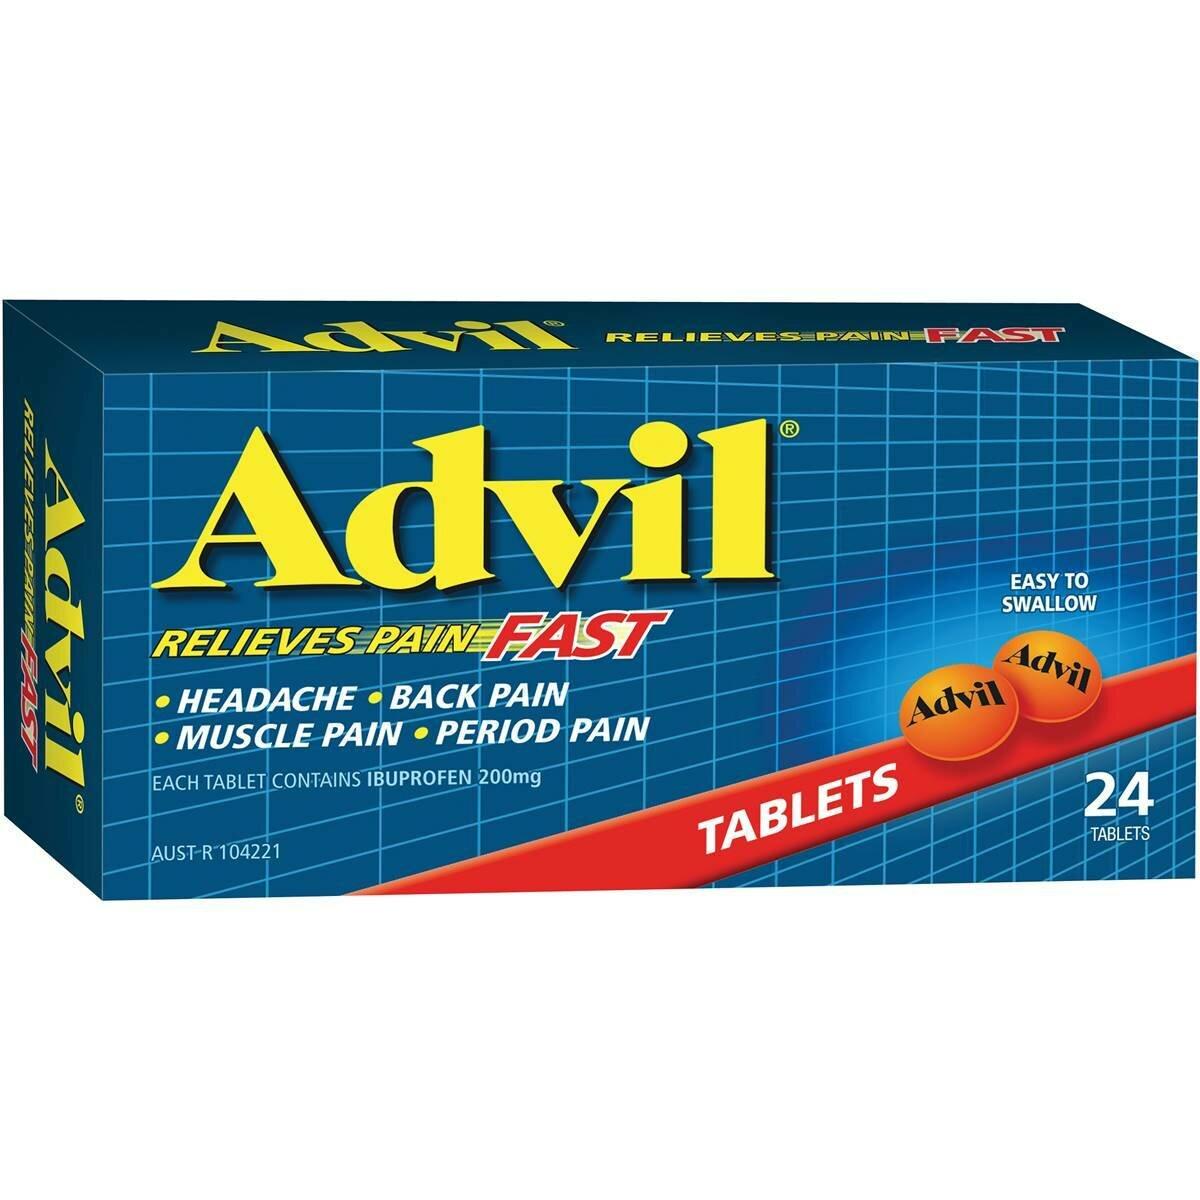 Advil Tablets 24pk